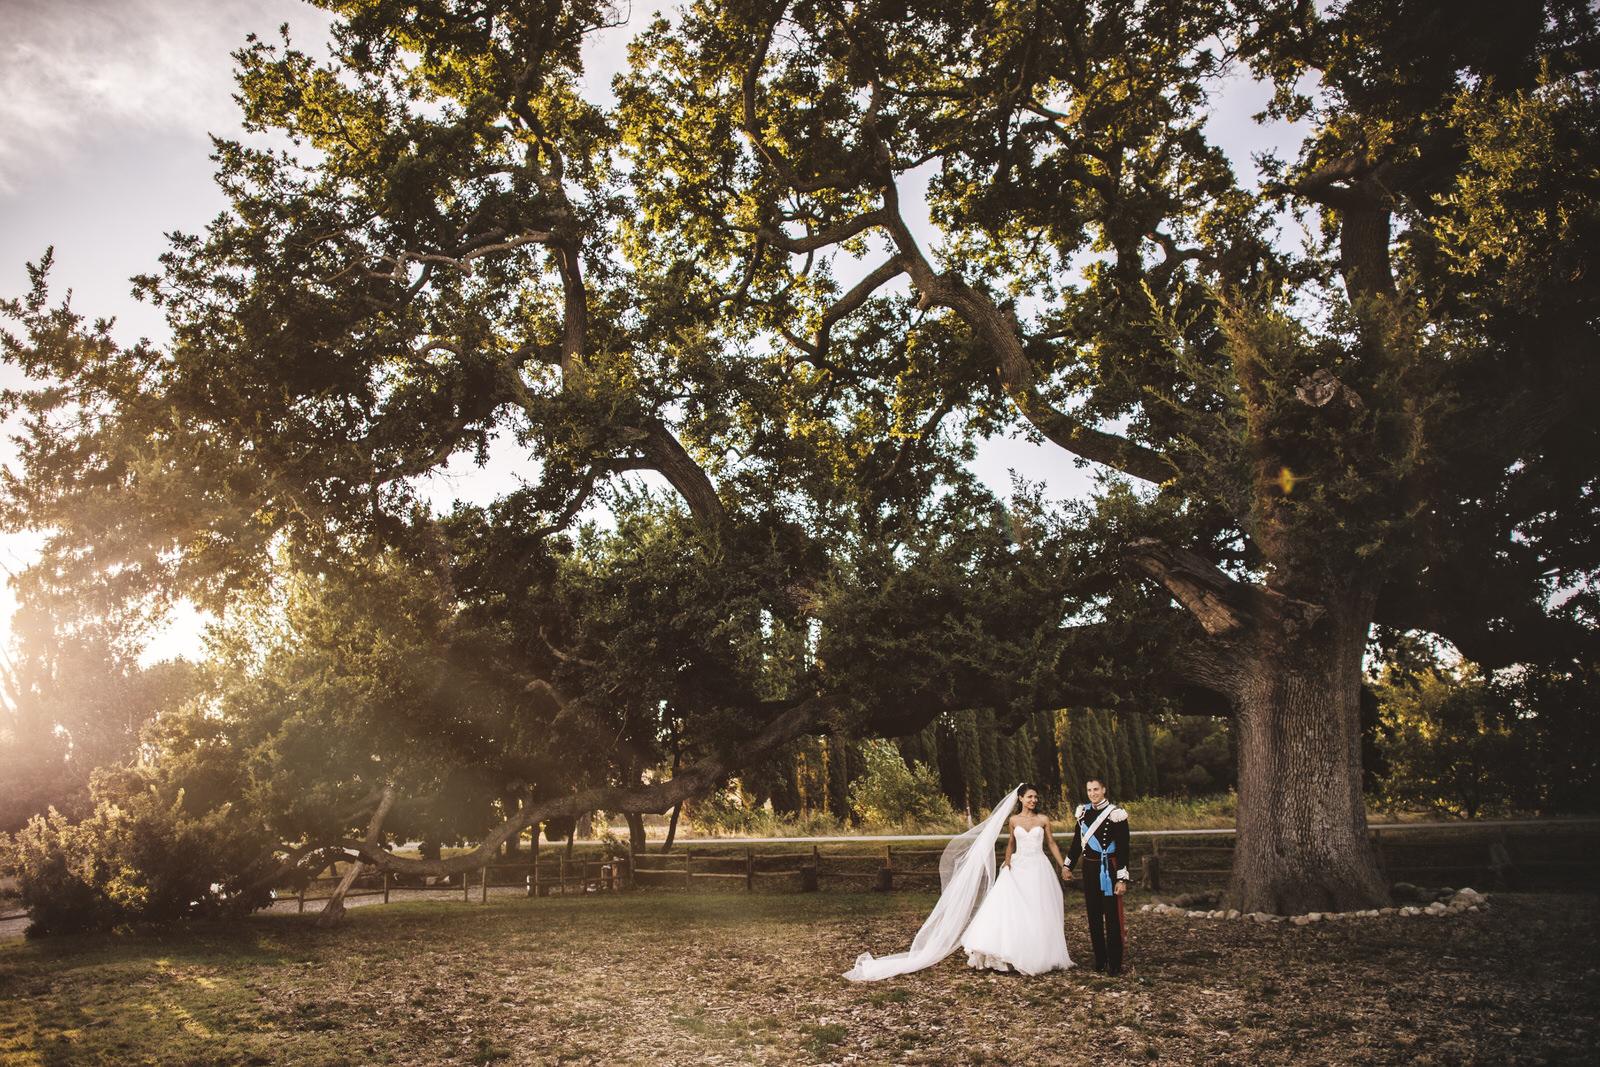 wedding photographer in italy-venice-tuscany-florence-amalfi coast-como lake-villa del balbianello-siena-amalfi-ravello-belmond-villa cimbrone26